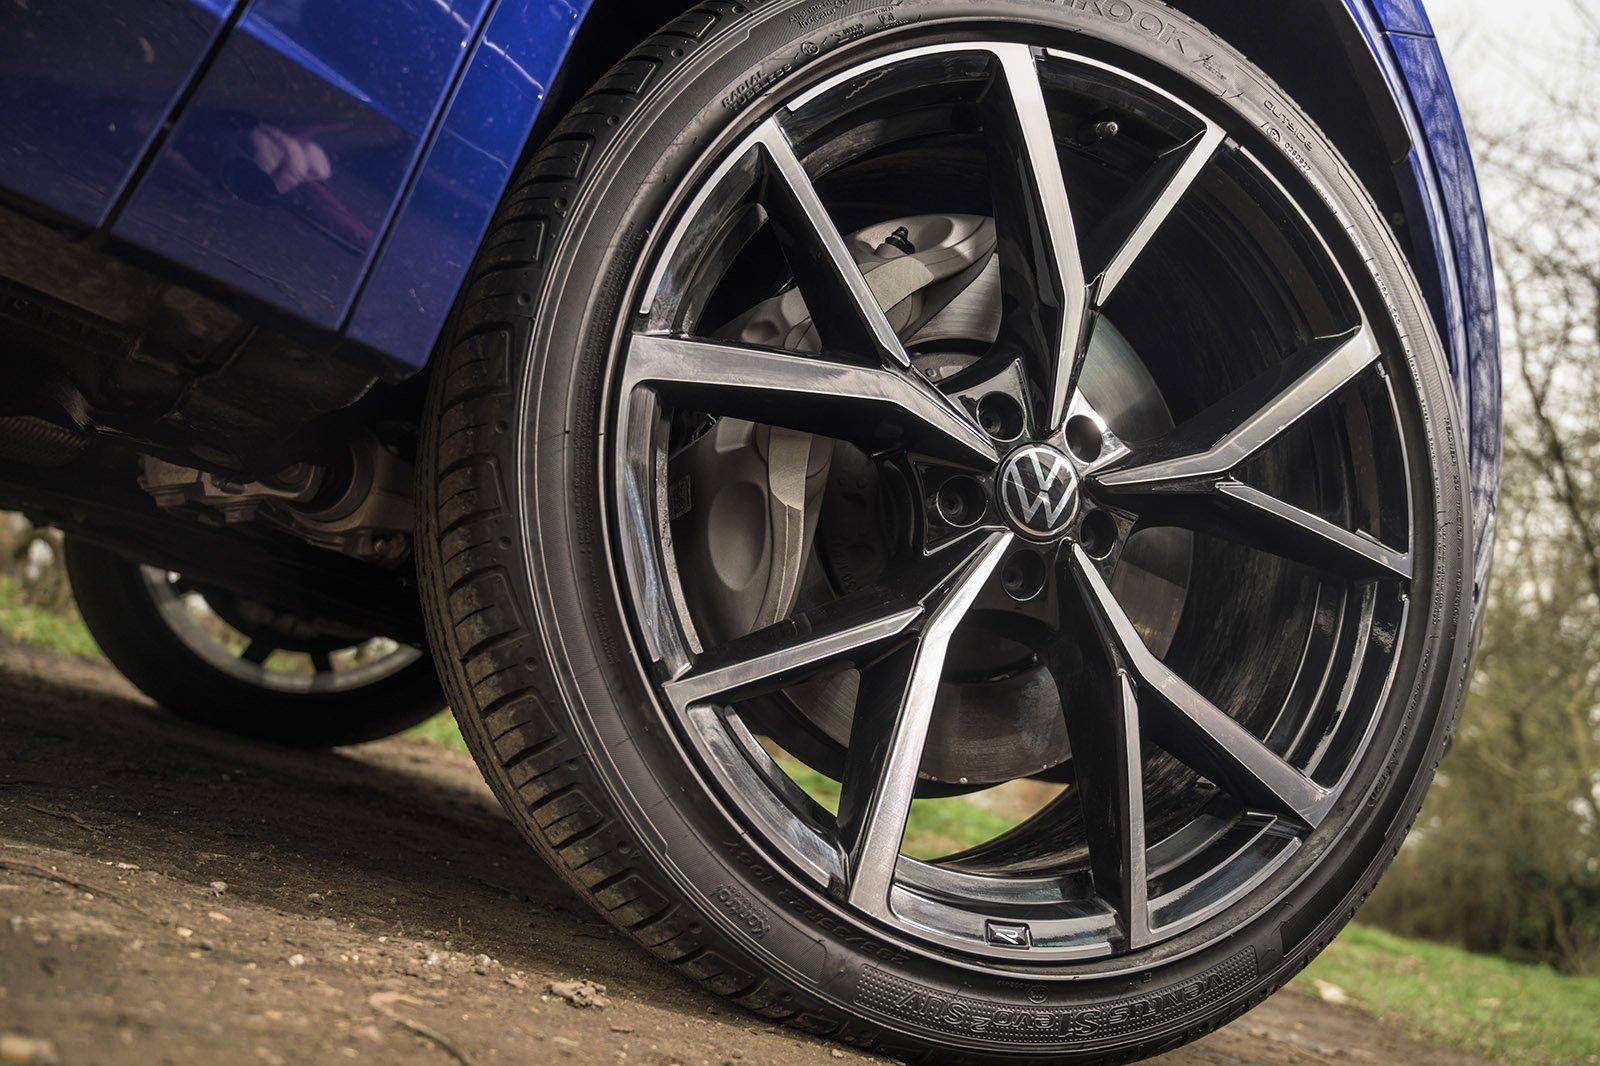 Volkswagen Touareg R 2021 wheel detail